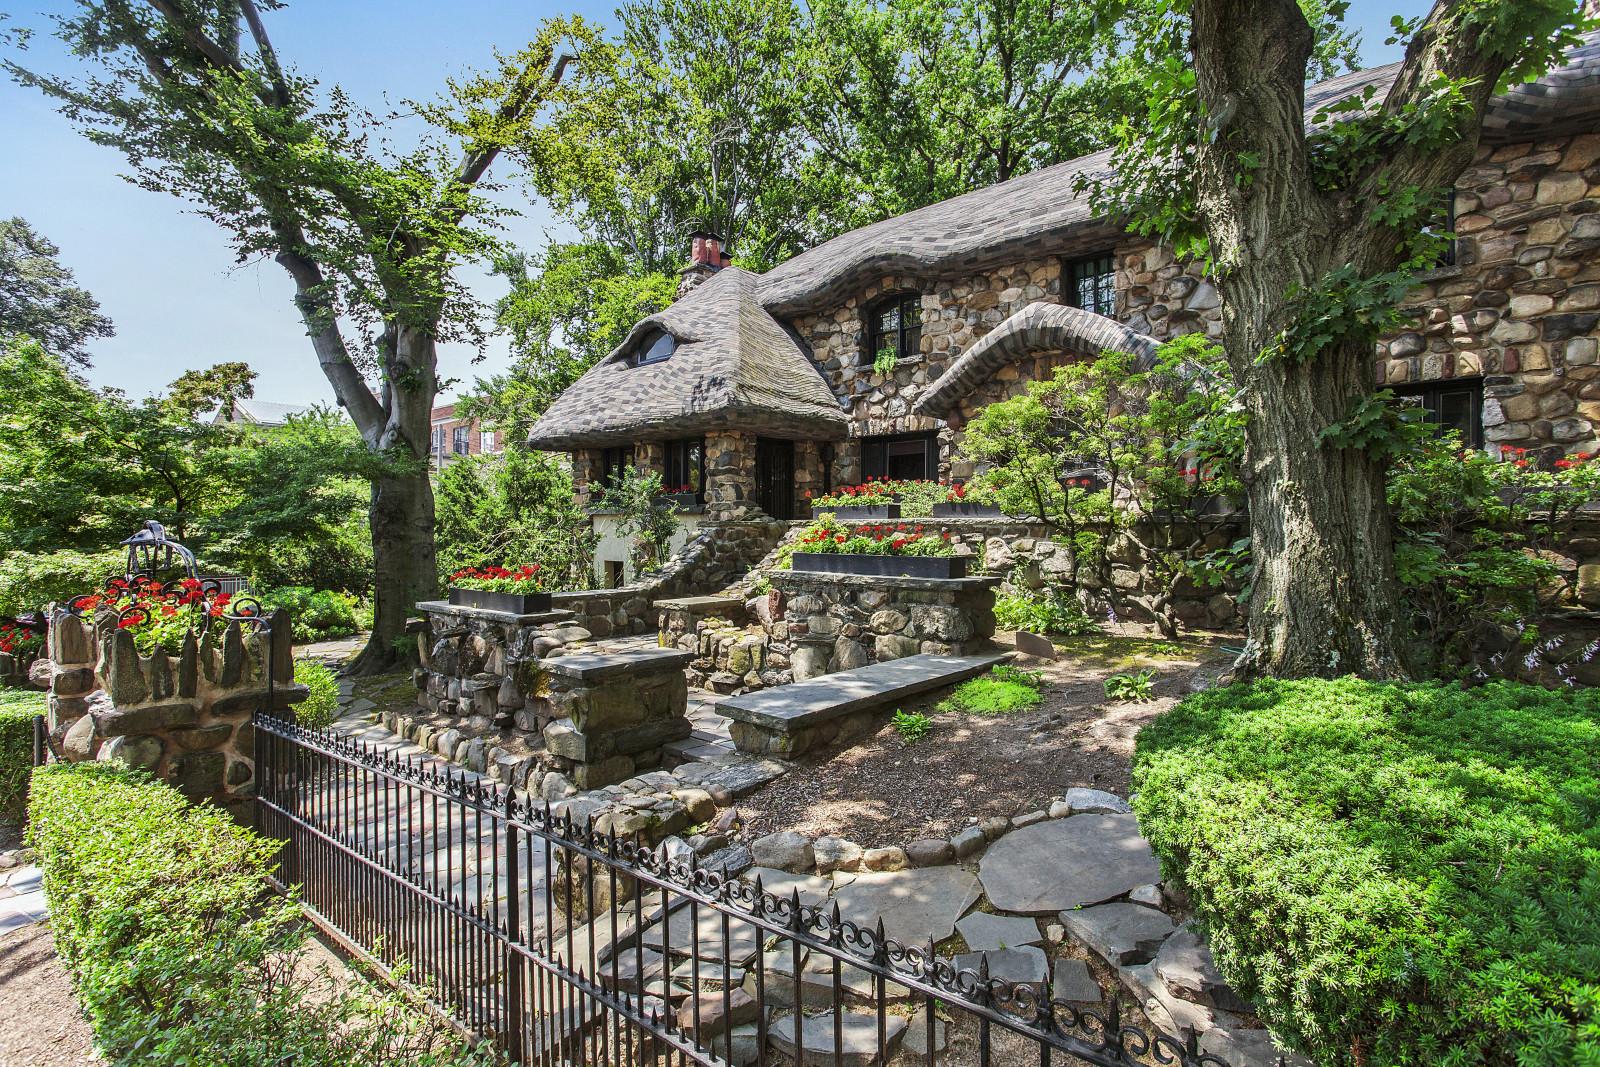 10 Whimsical Fairy Tale Homes